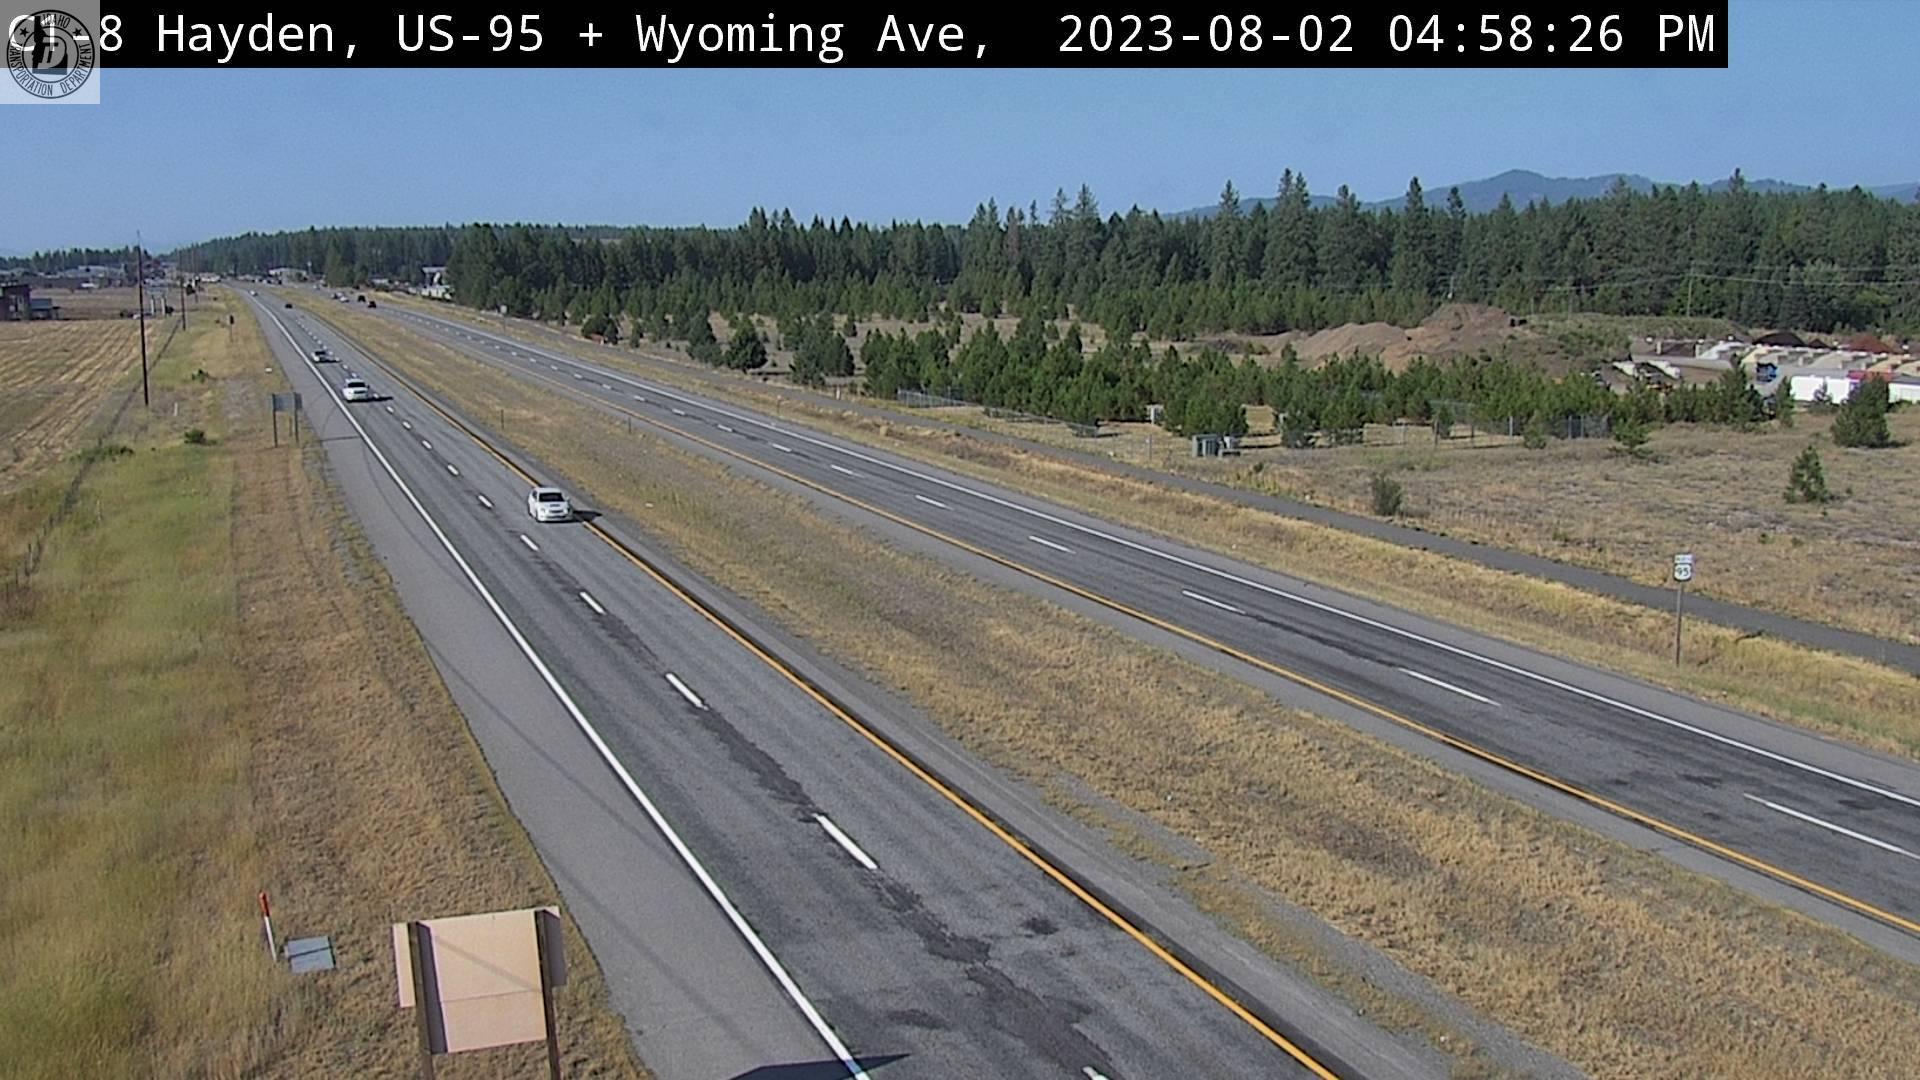 Wyoming Ave